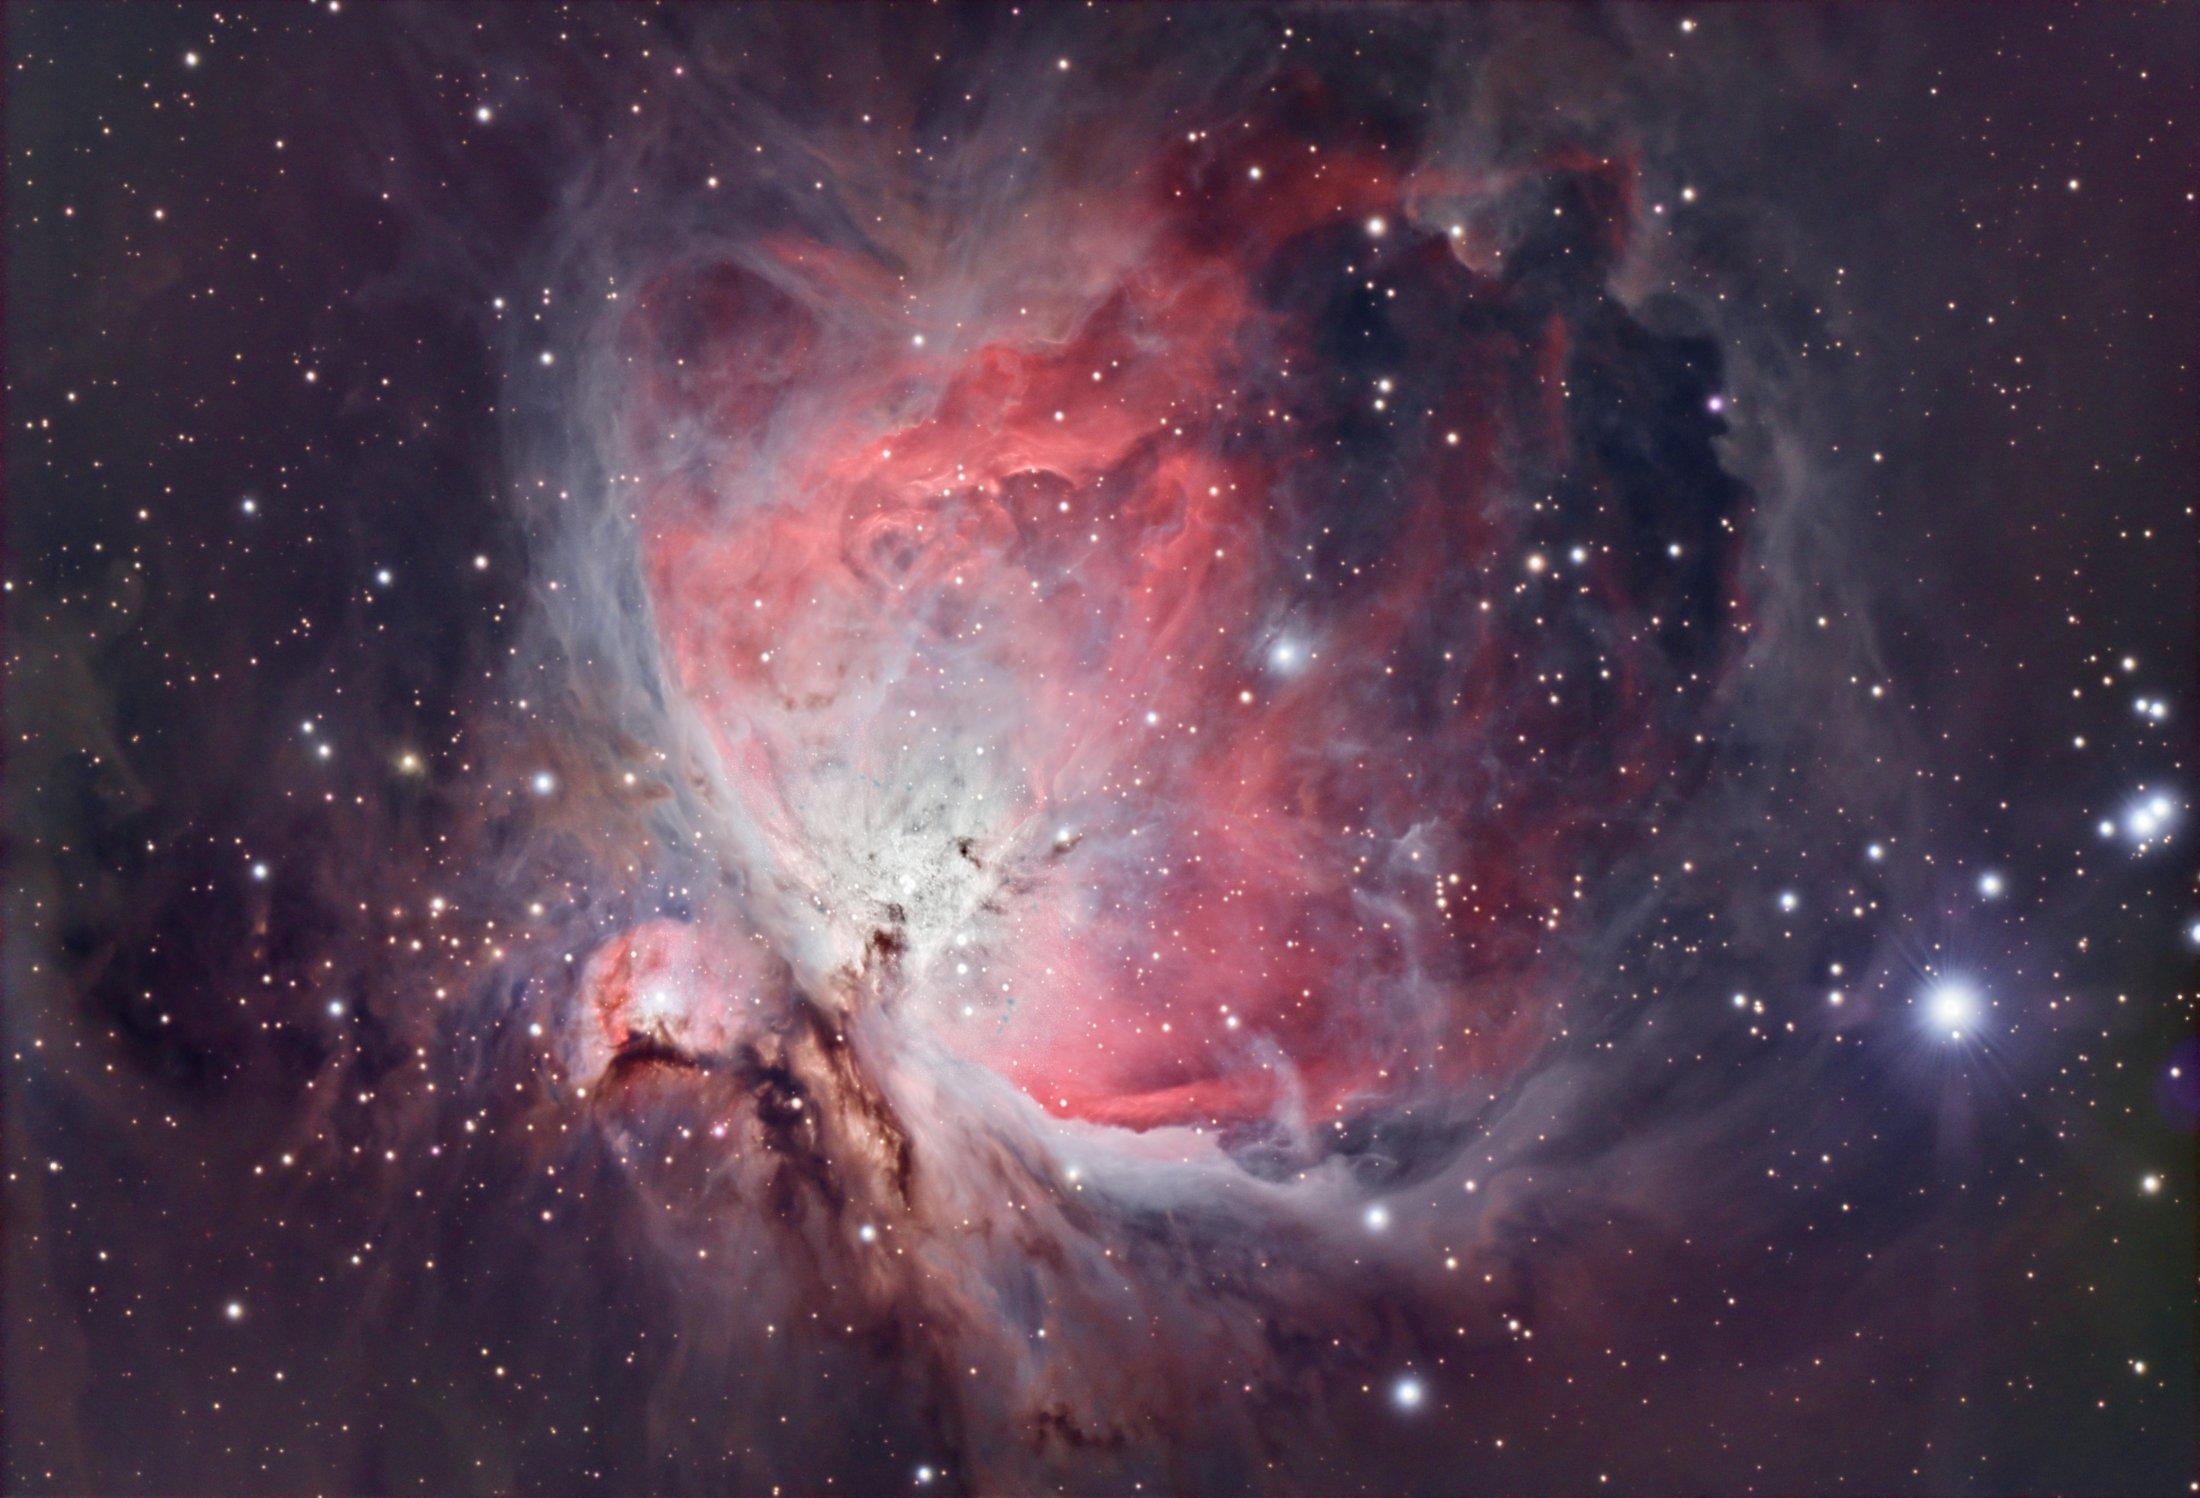 M42 - Manel Polanco